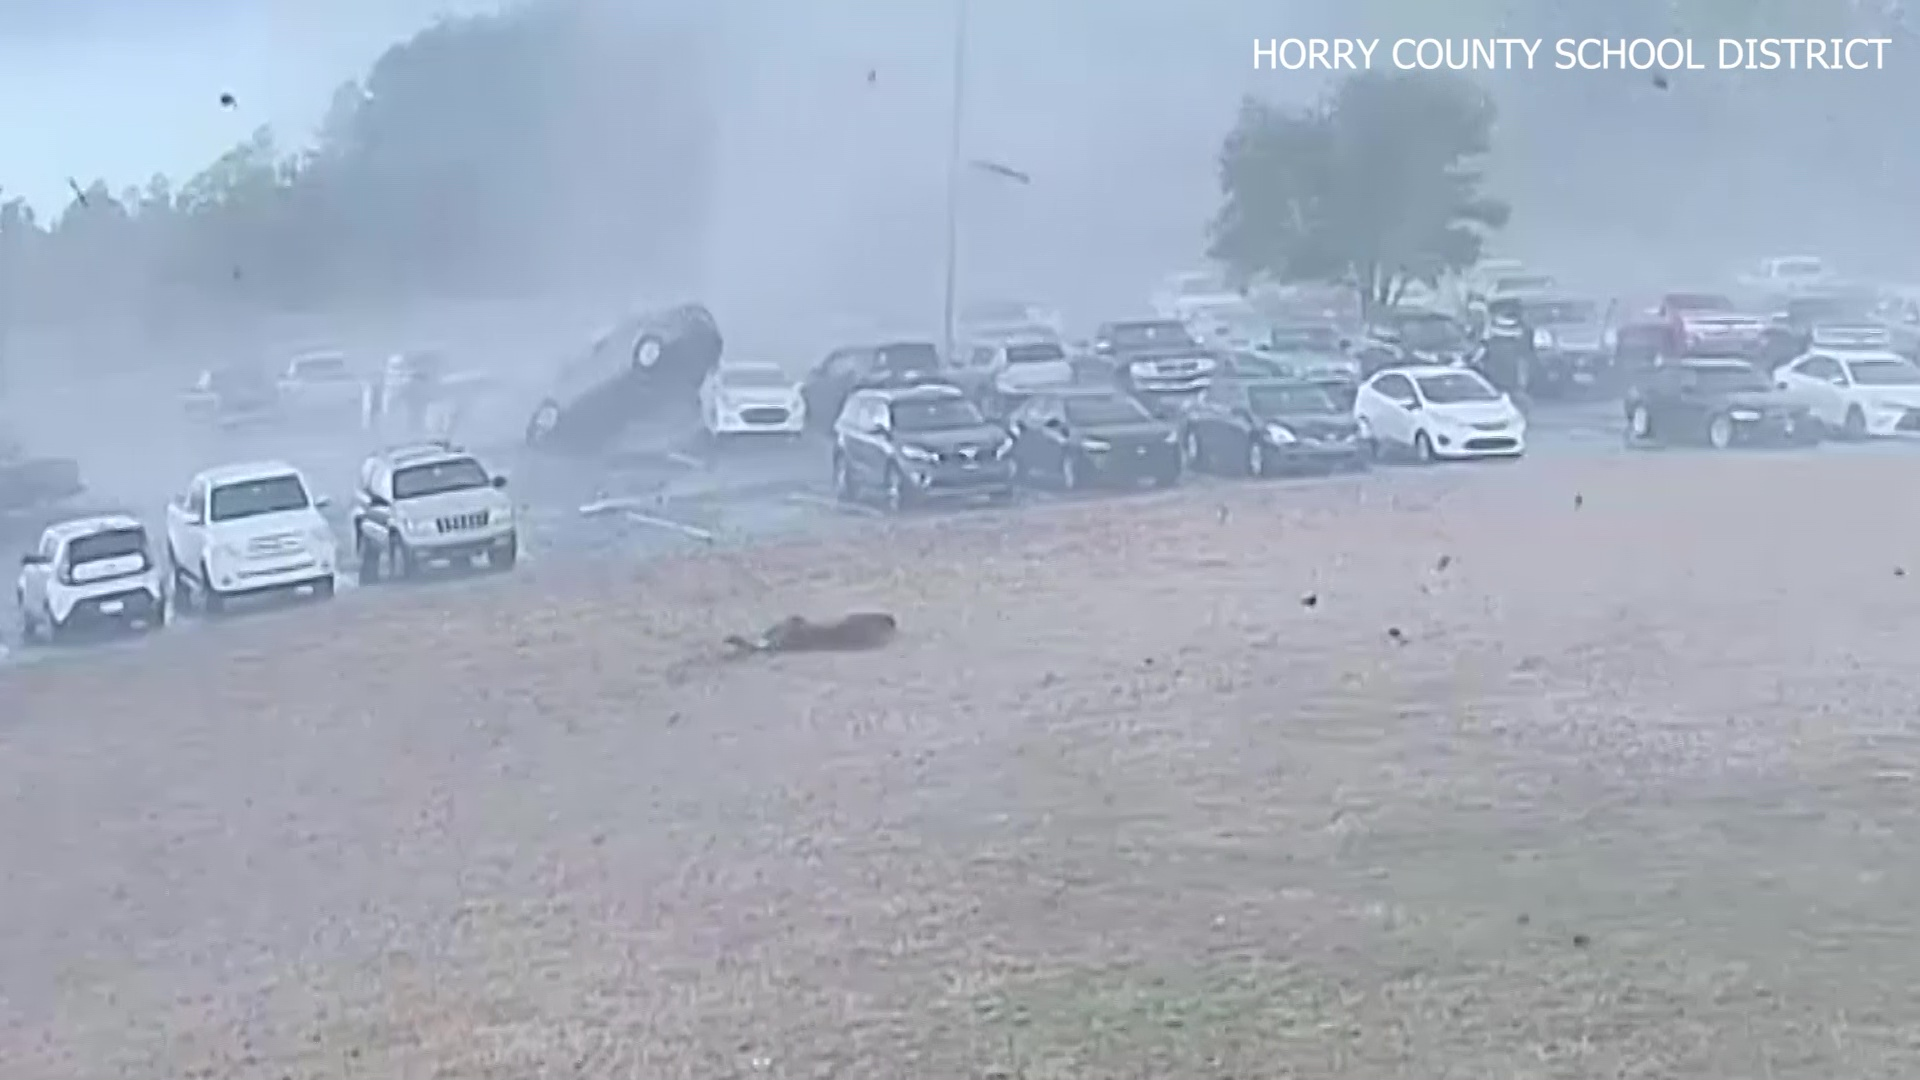 CAUGHT ON CAMERA: Tornado flips cars at South Carolina high school